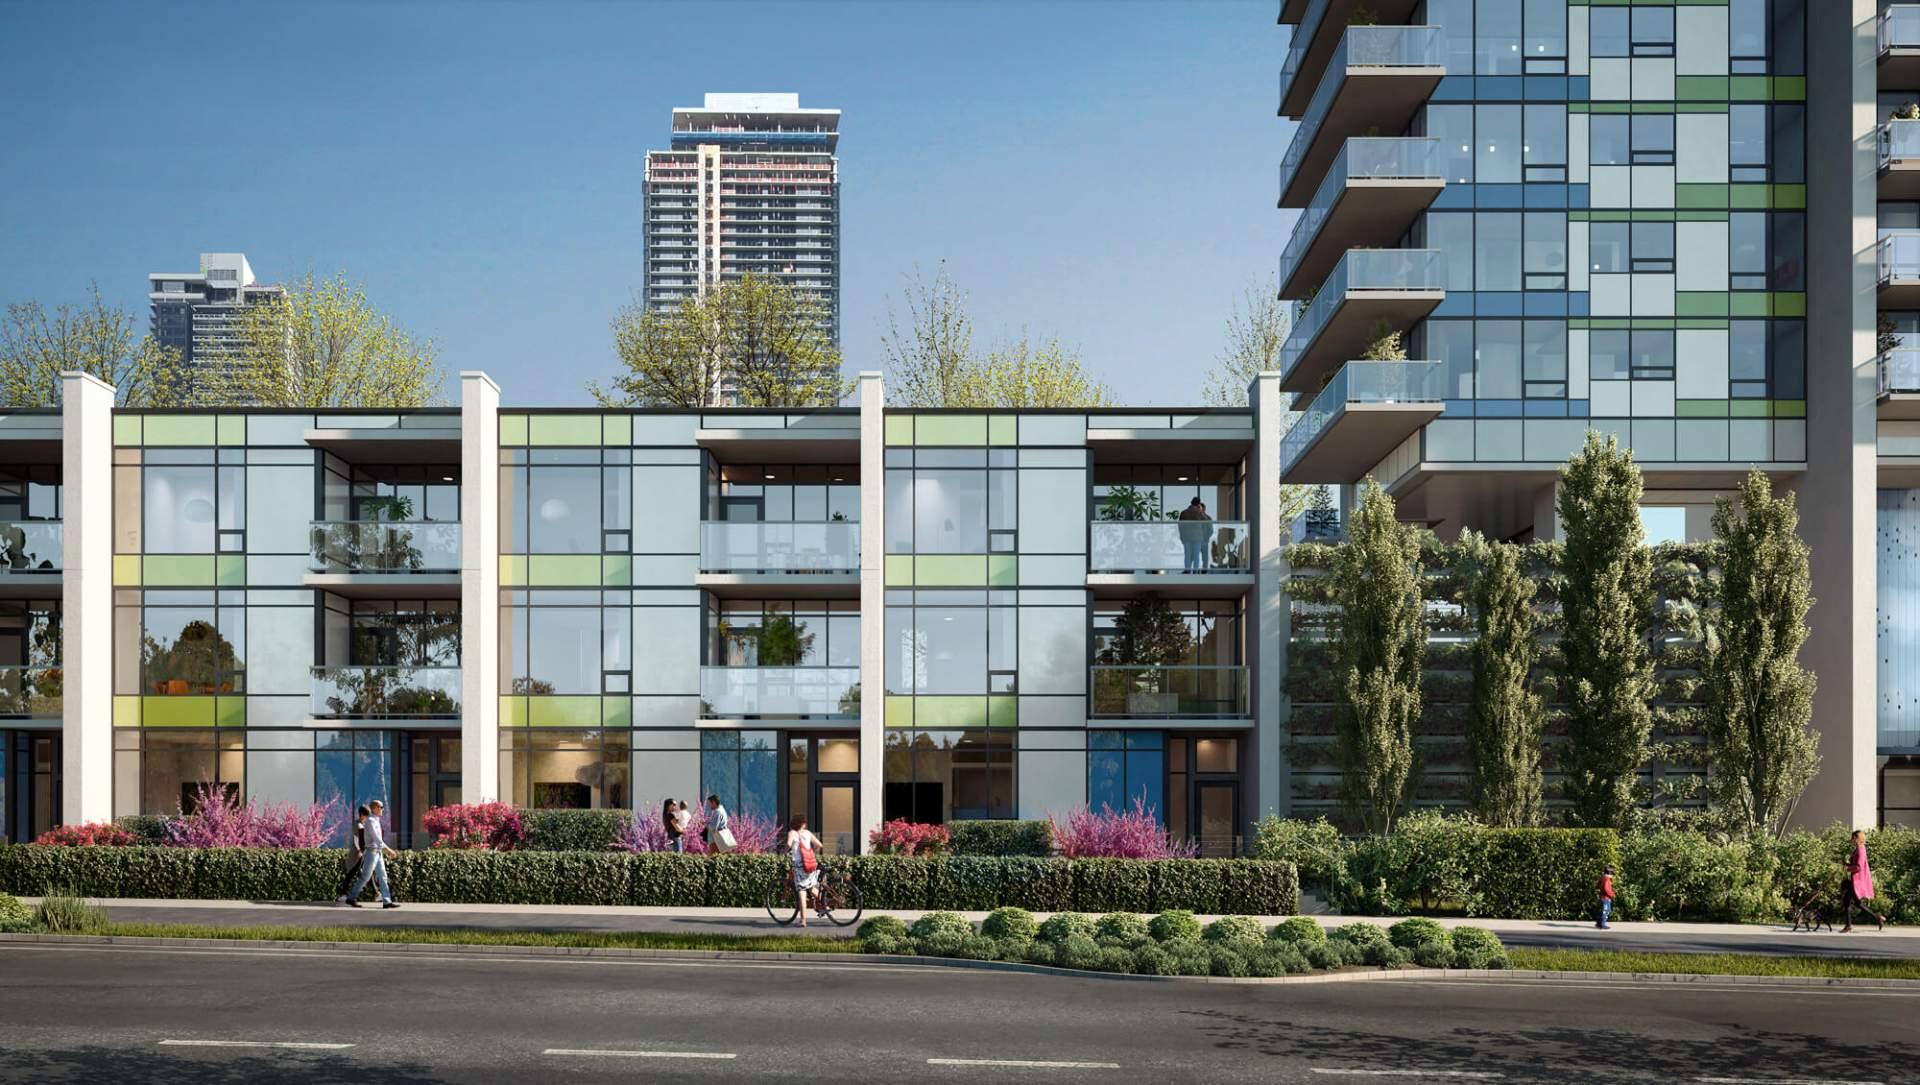 3-storey, Ground-oriented Work/live Townhomes Facing Alaska Street.